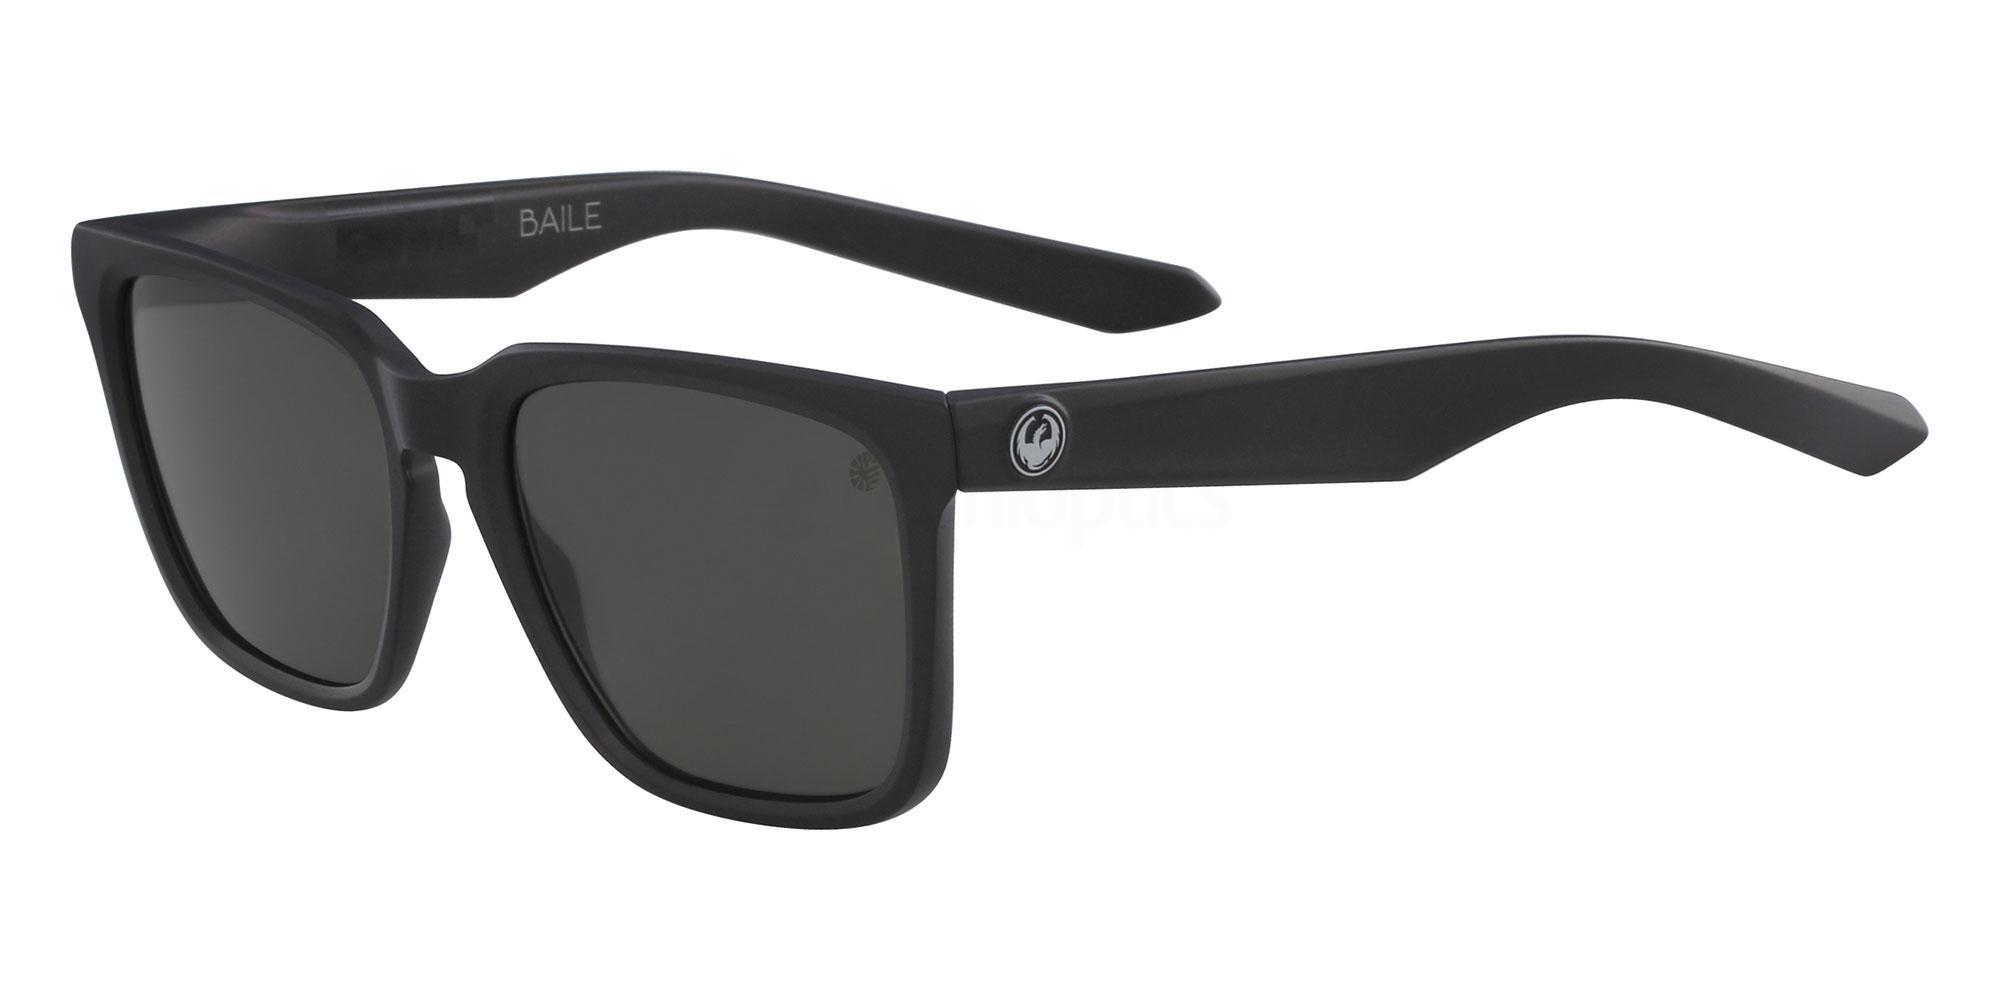 004 DR BAILE POLAR Sunglasses, Dragon